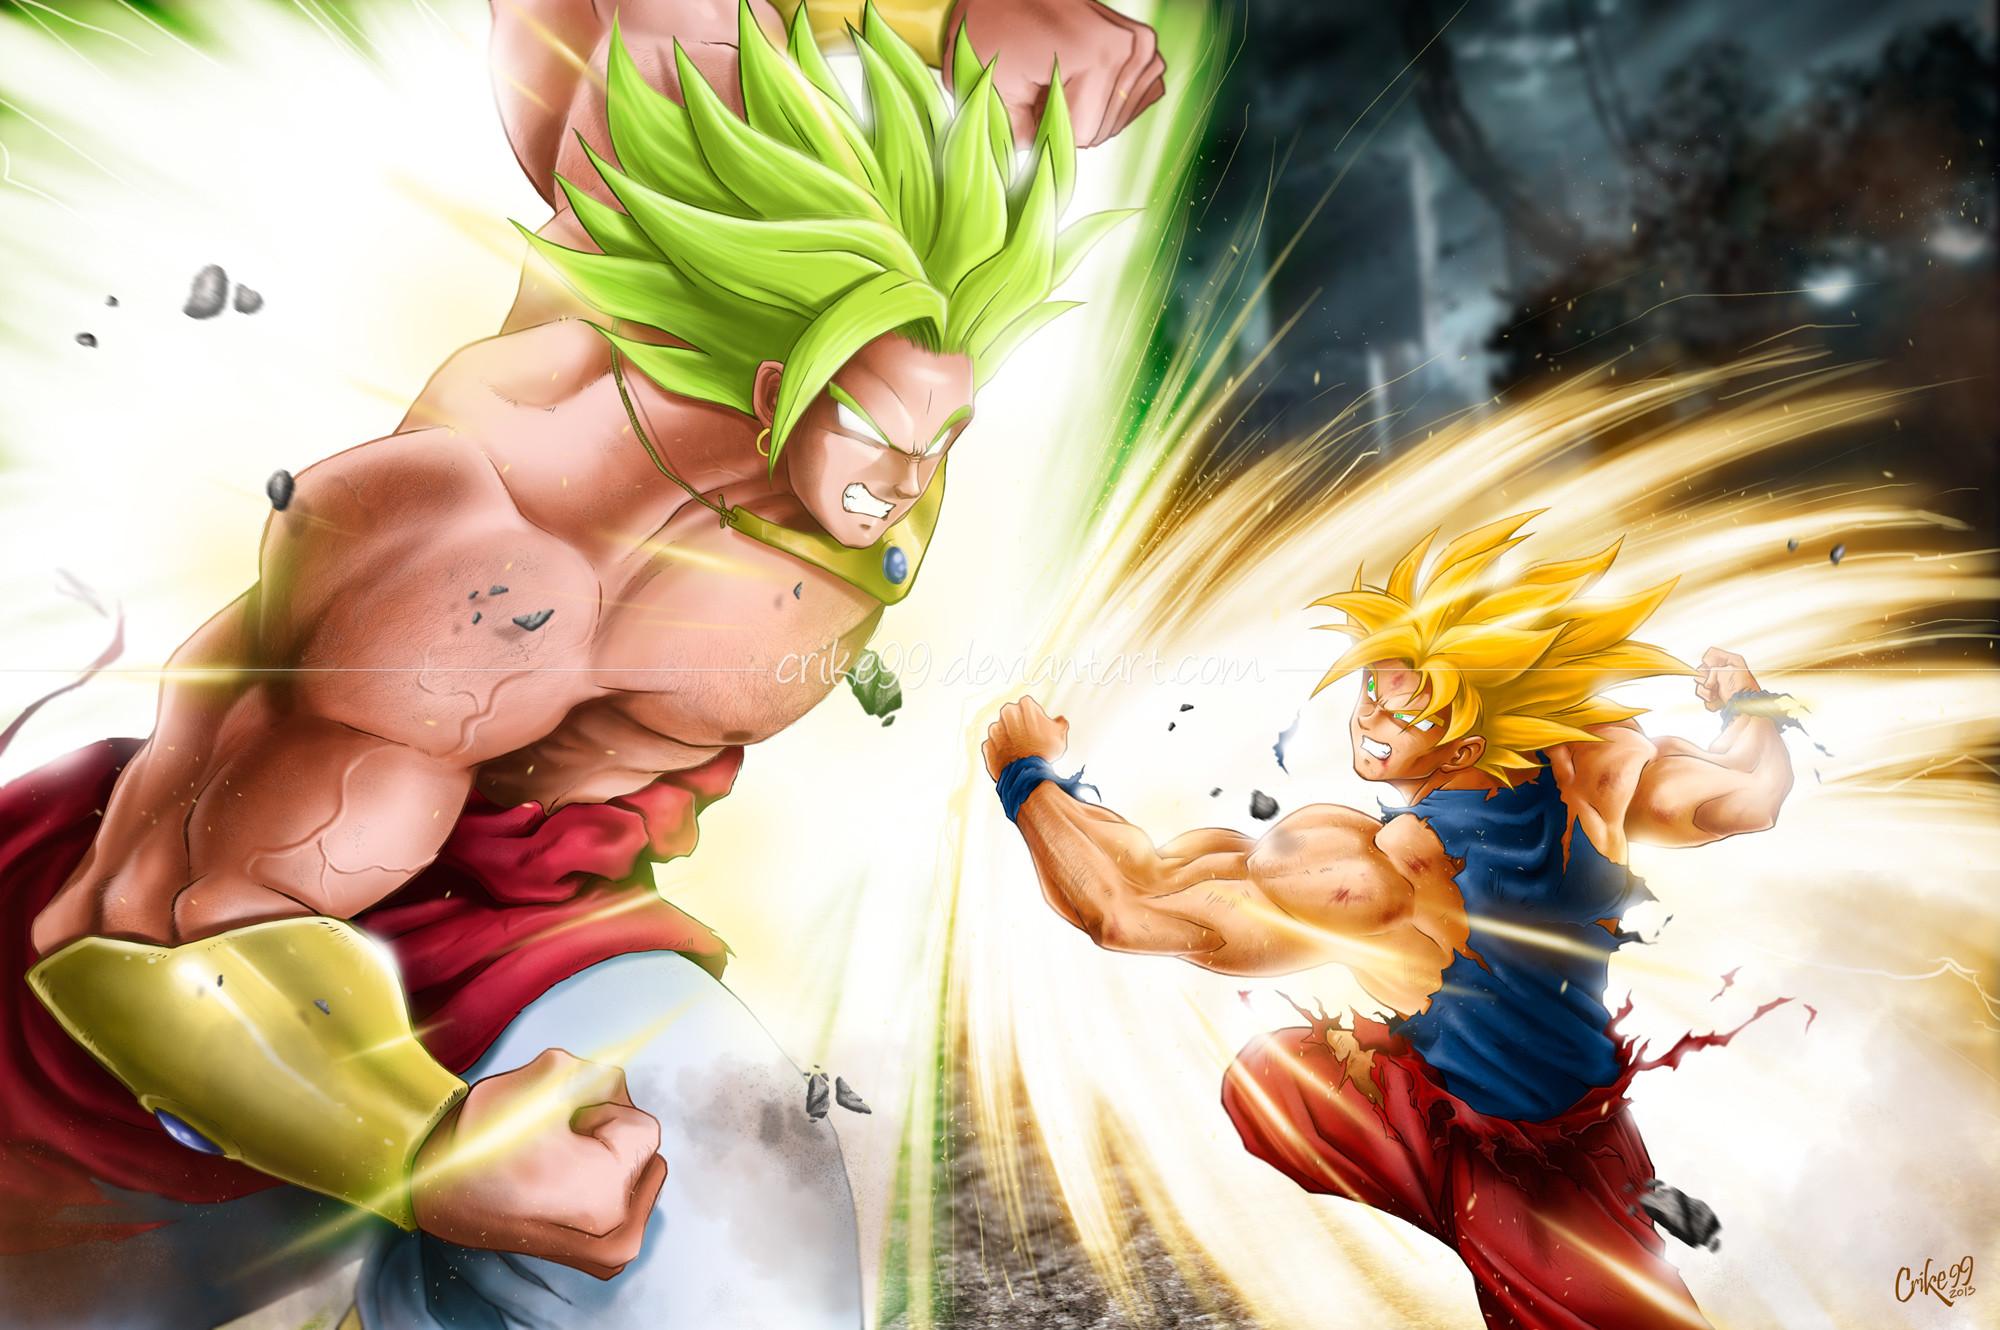 Goku vs Broly – REMAKE 2013 – by Crike99 on DeviantArt